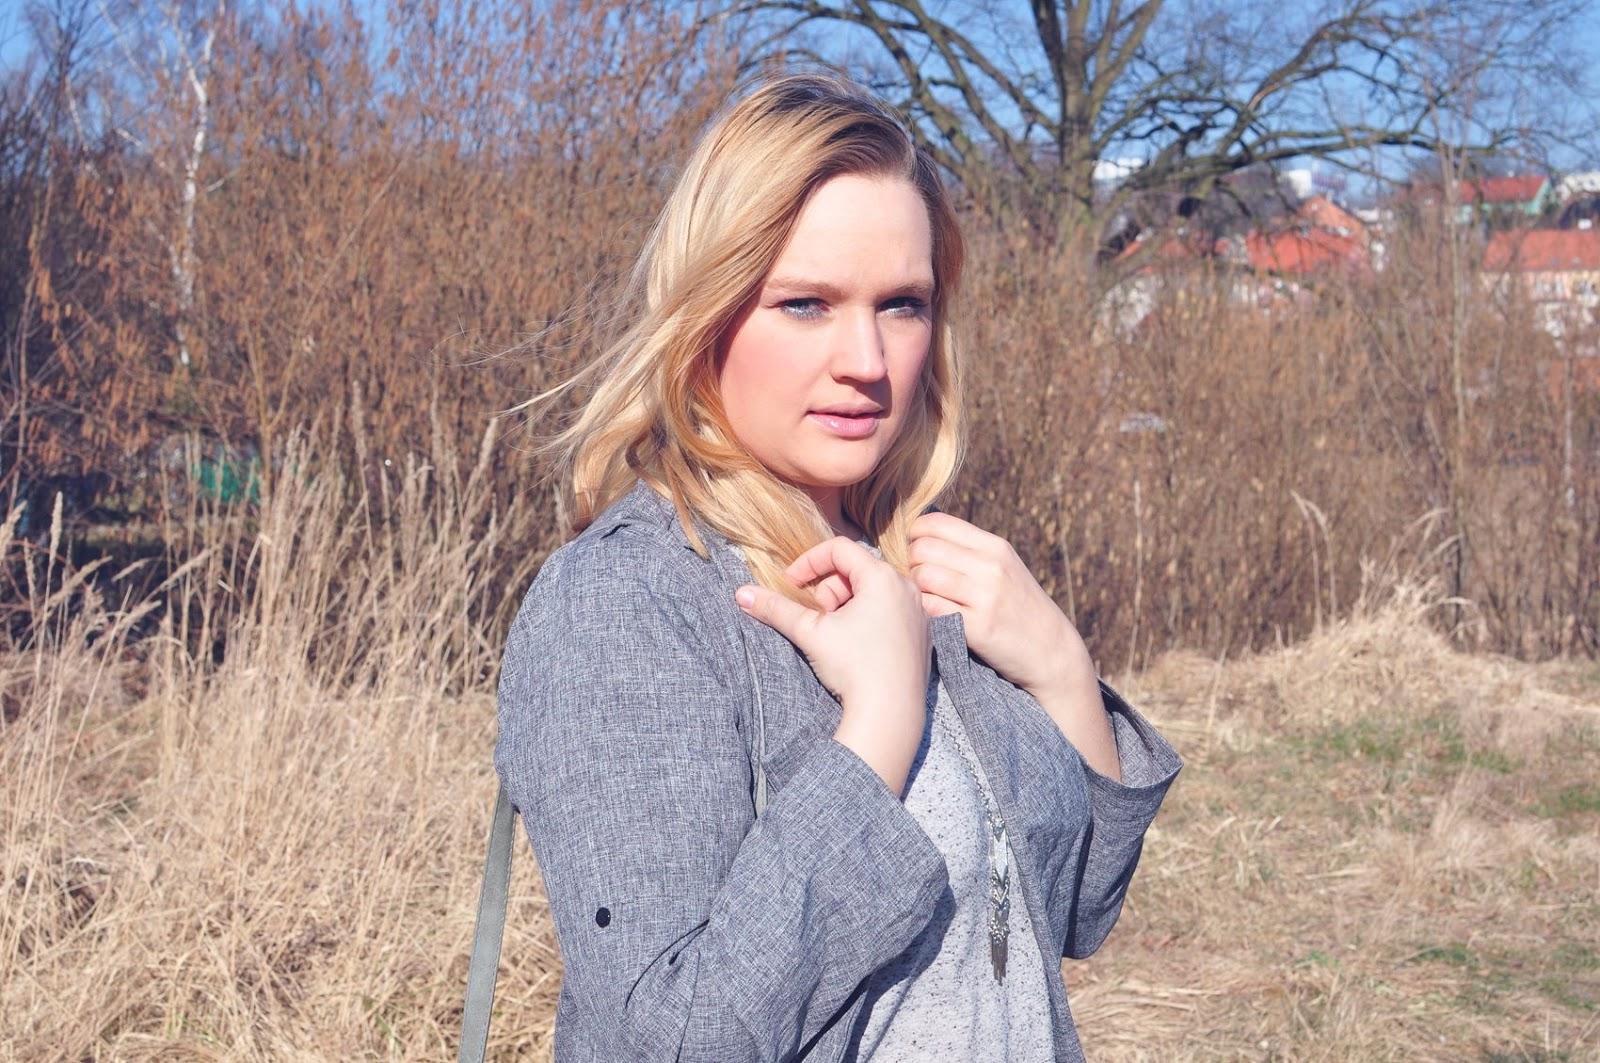 matka-bloguje